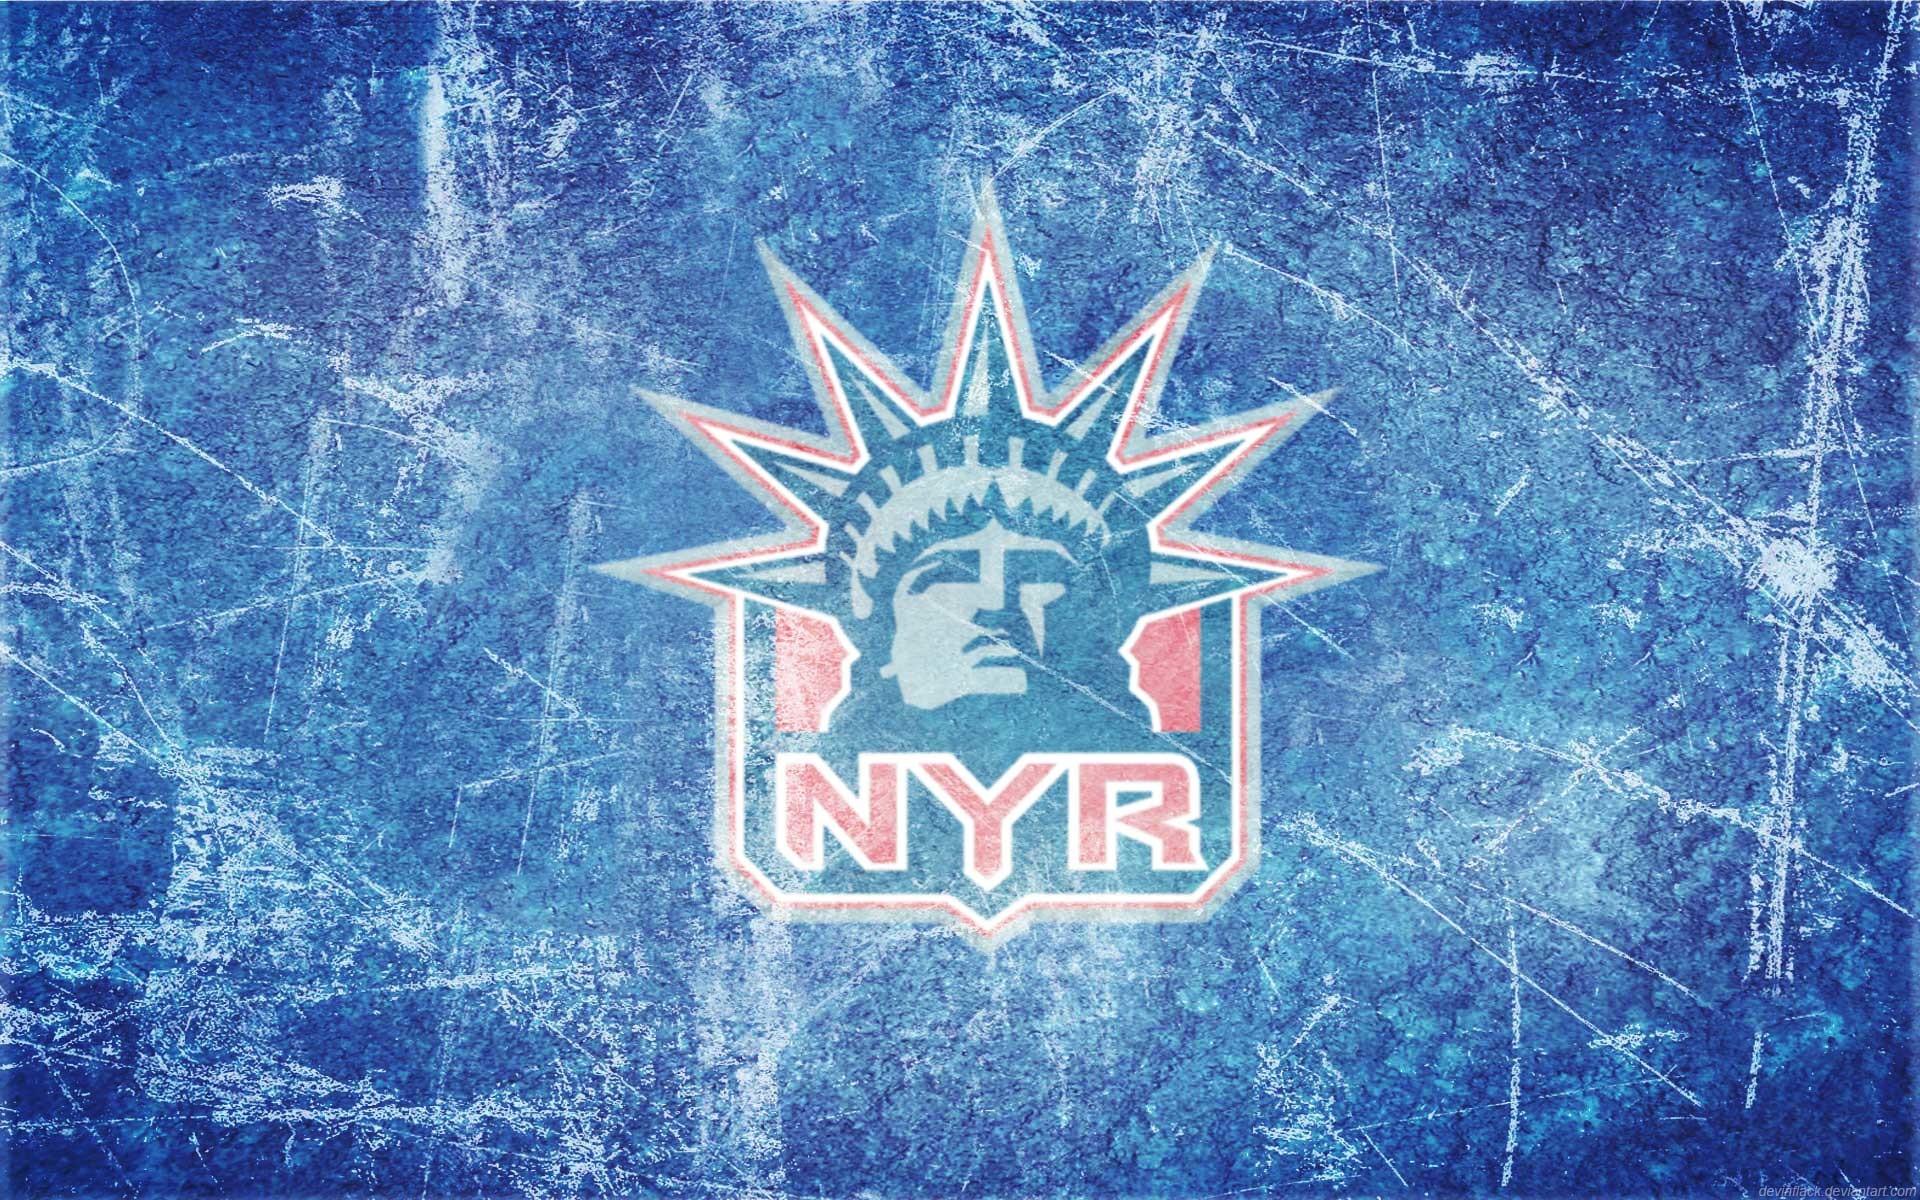 Wallpaper of the day: New York Rangers | New York Rangers wallpapers